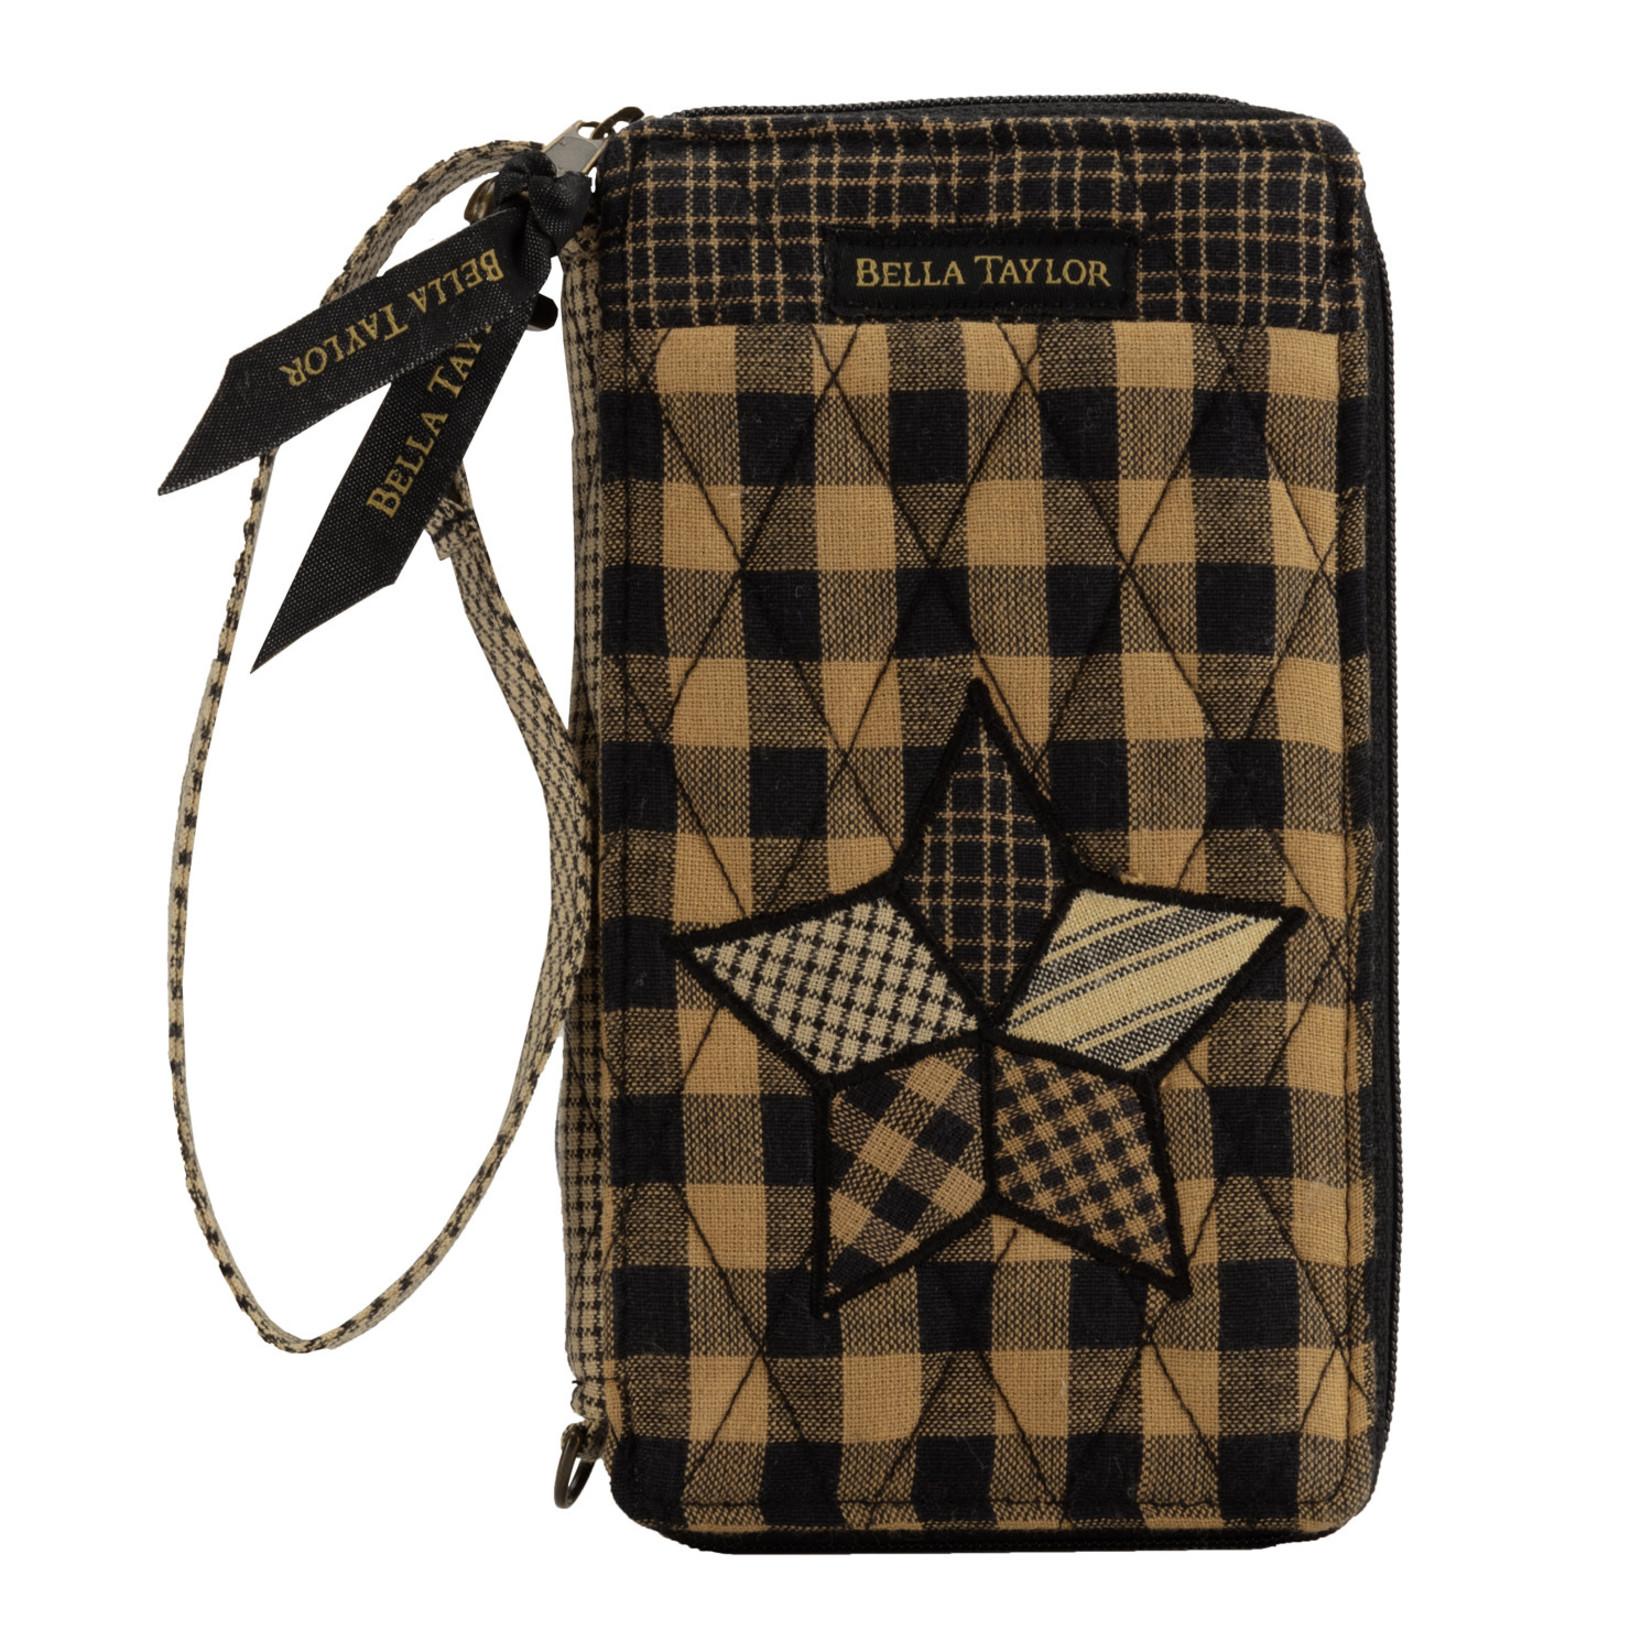 Bella Taylor Farmhouse Star - Modern Wristlet Wallet